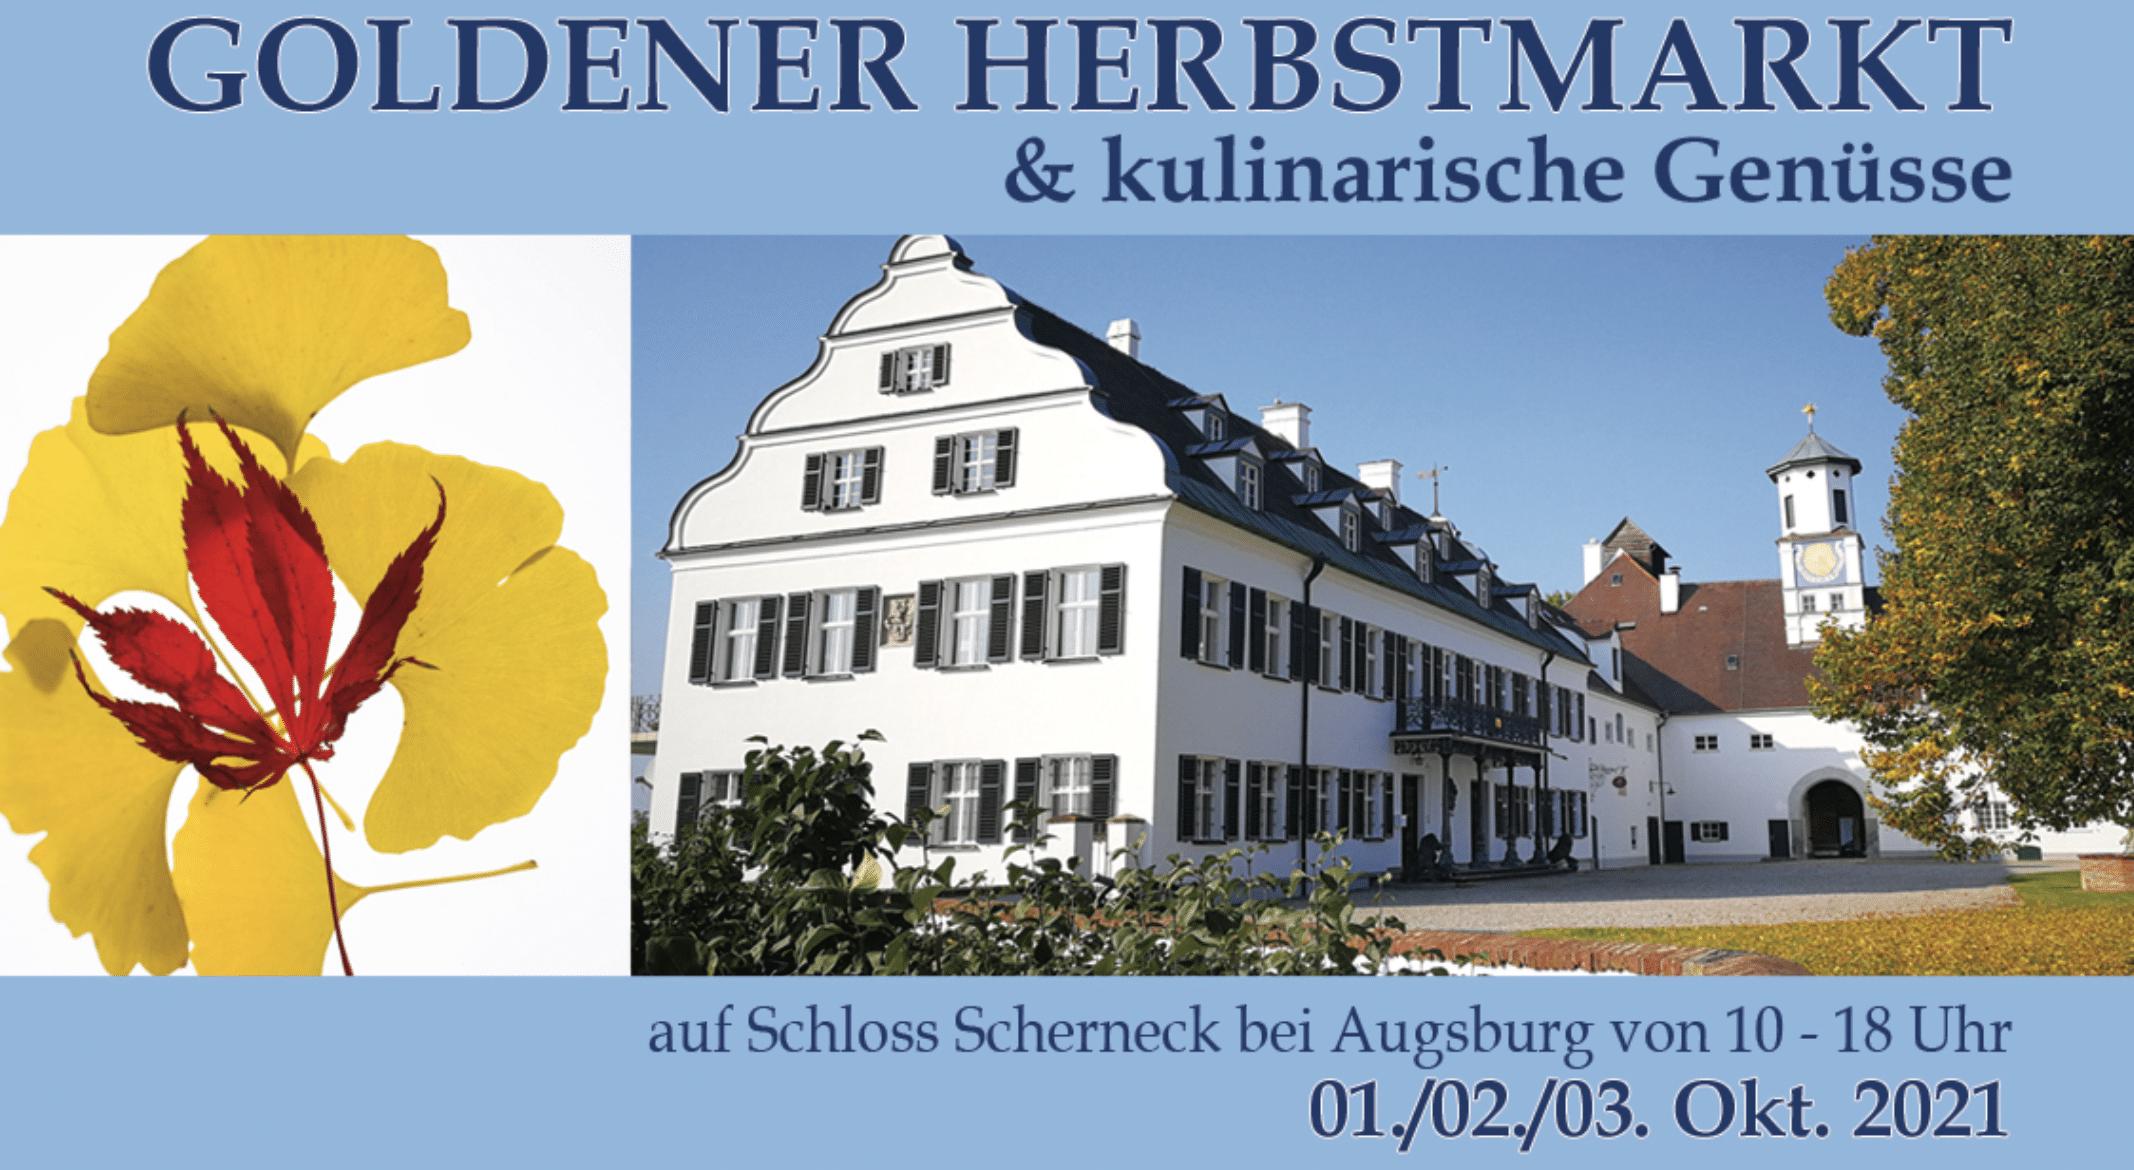 Herbstmarkt Schloss Scherneck bei Augsburg